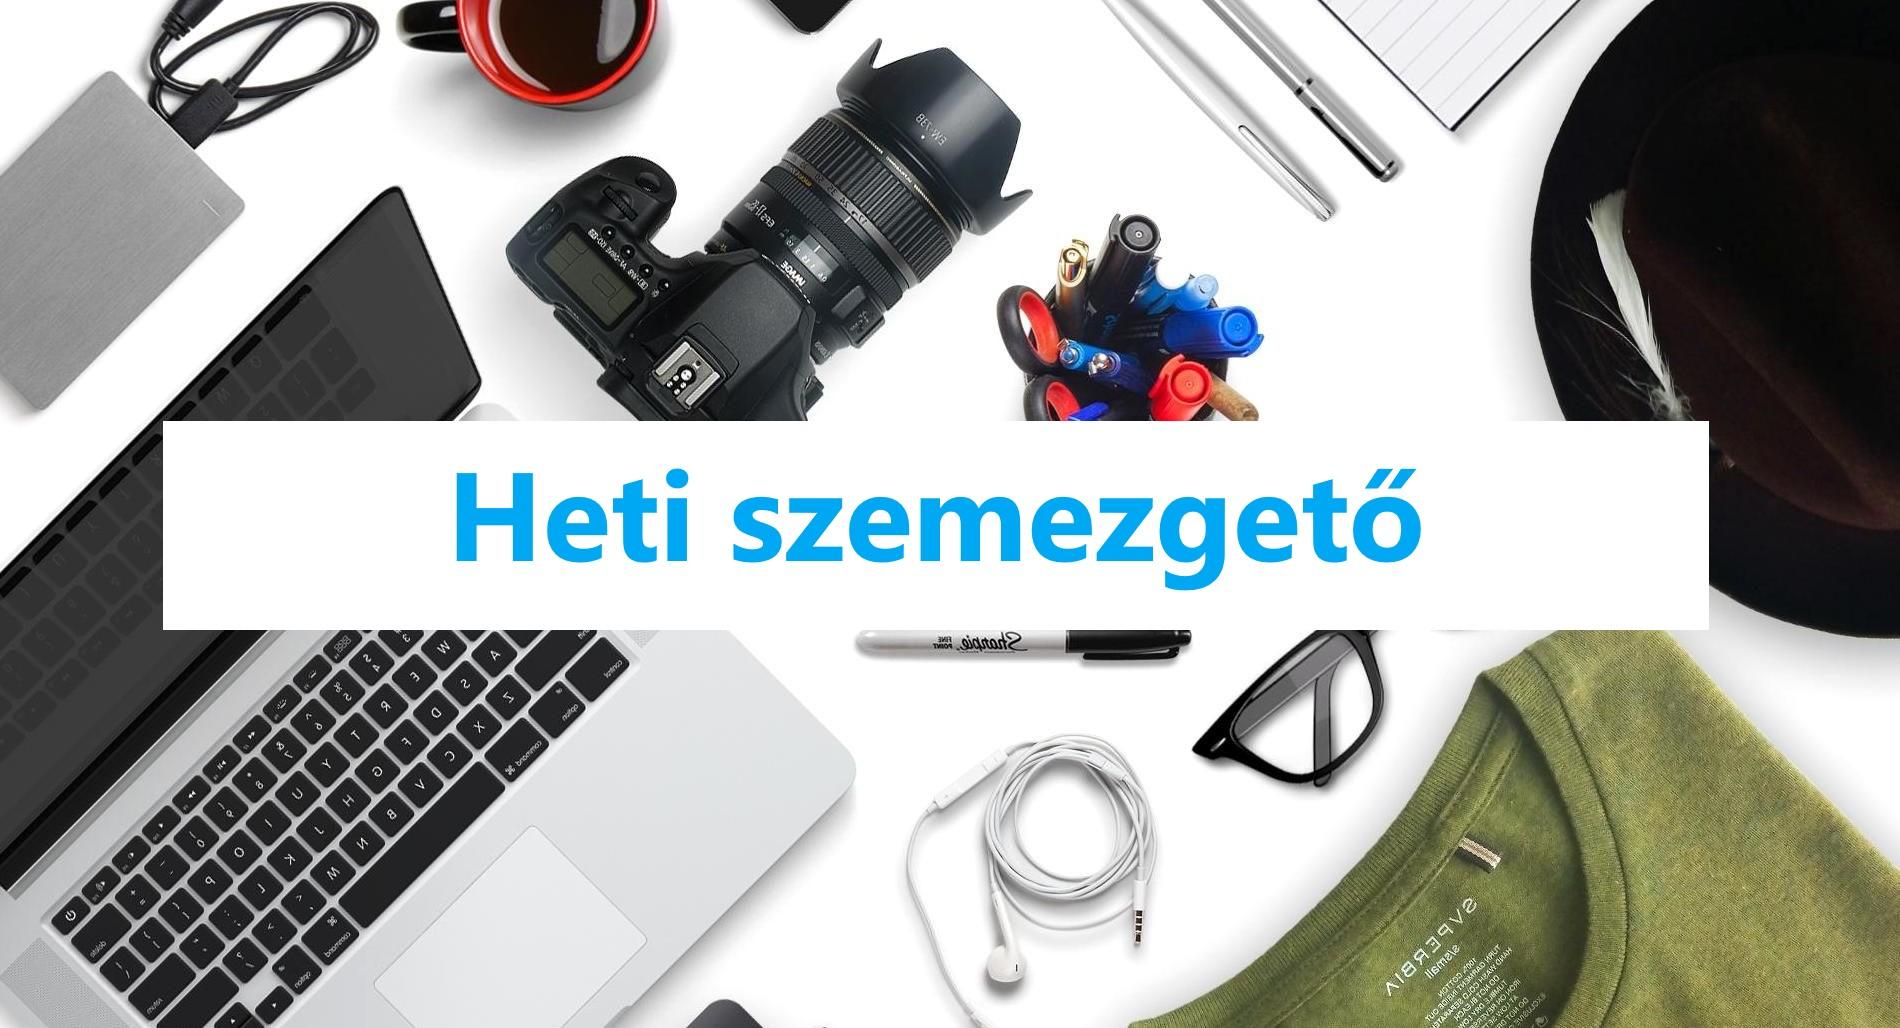 heti_szemezgeto_uj_32.jpg